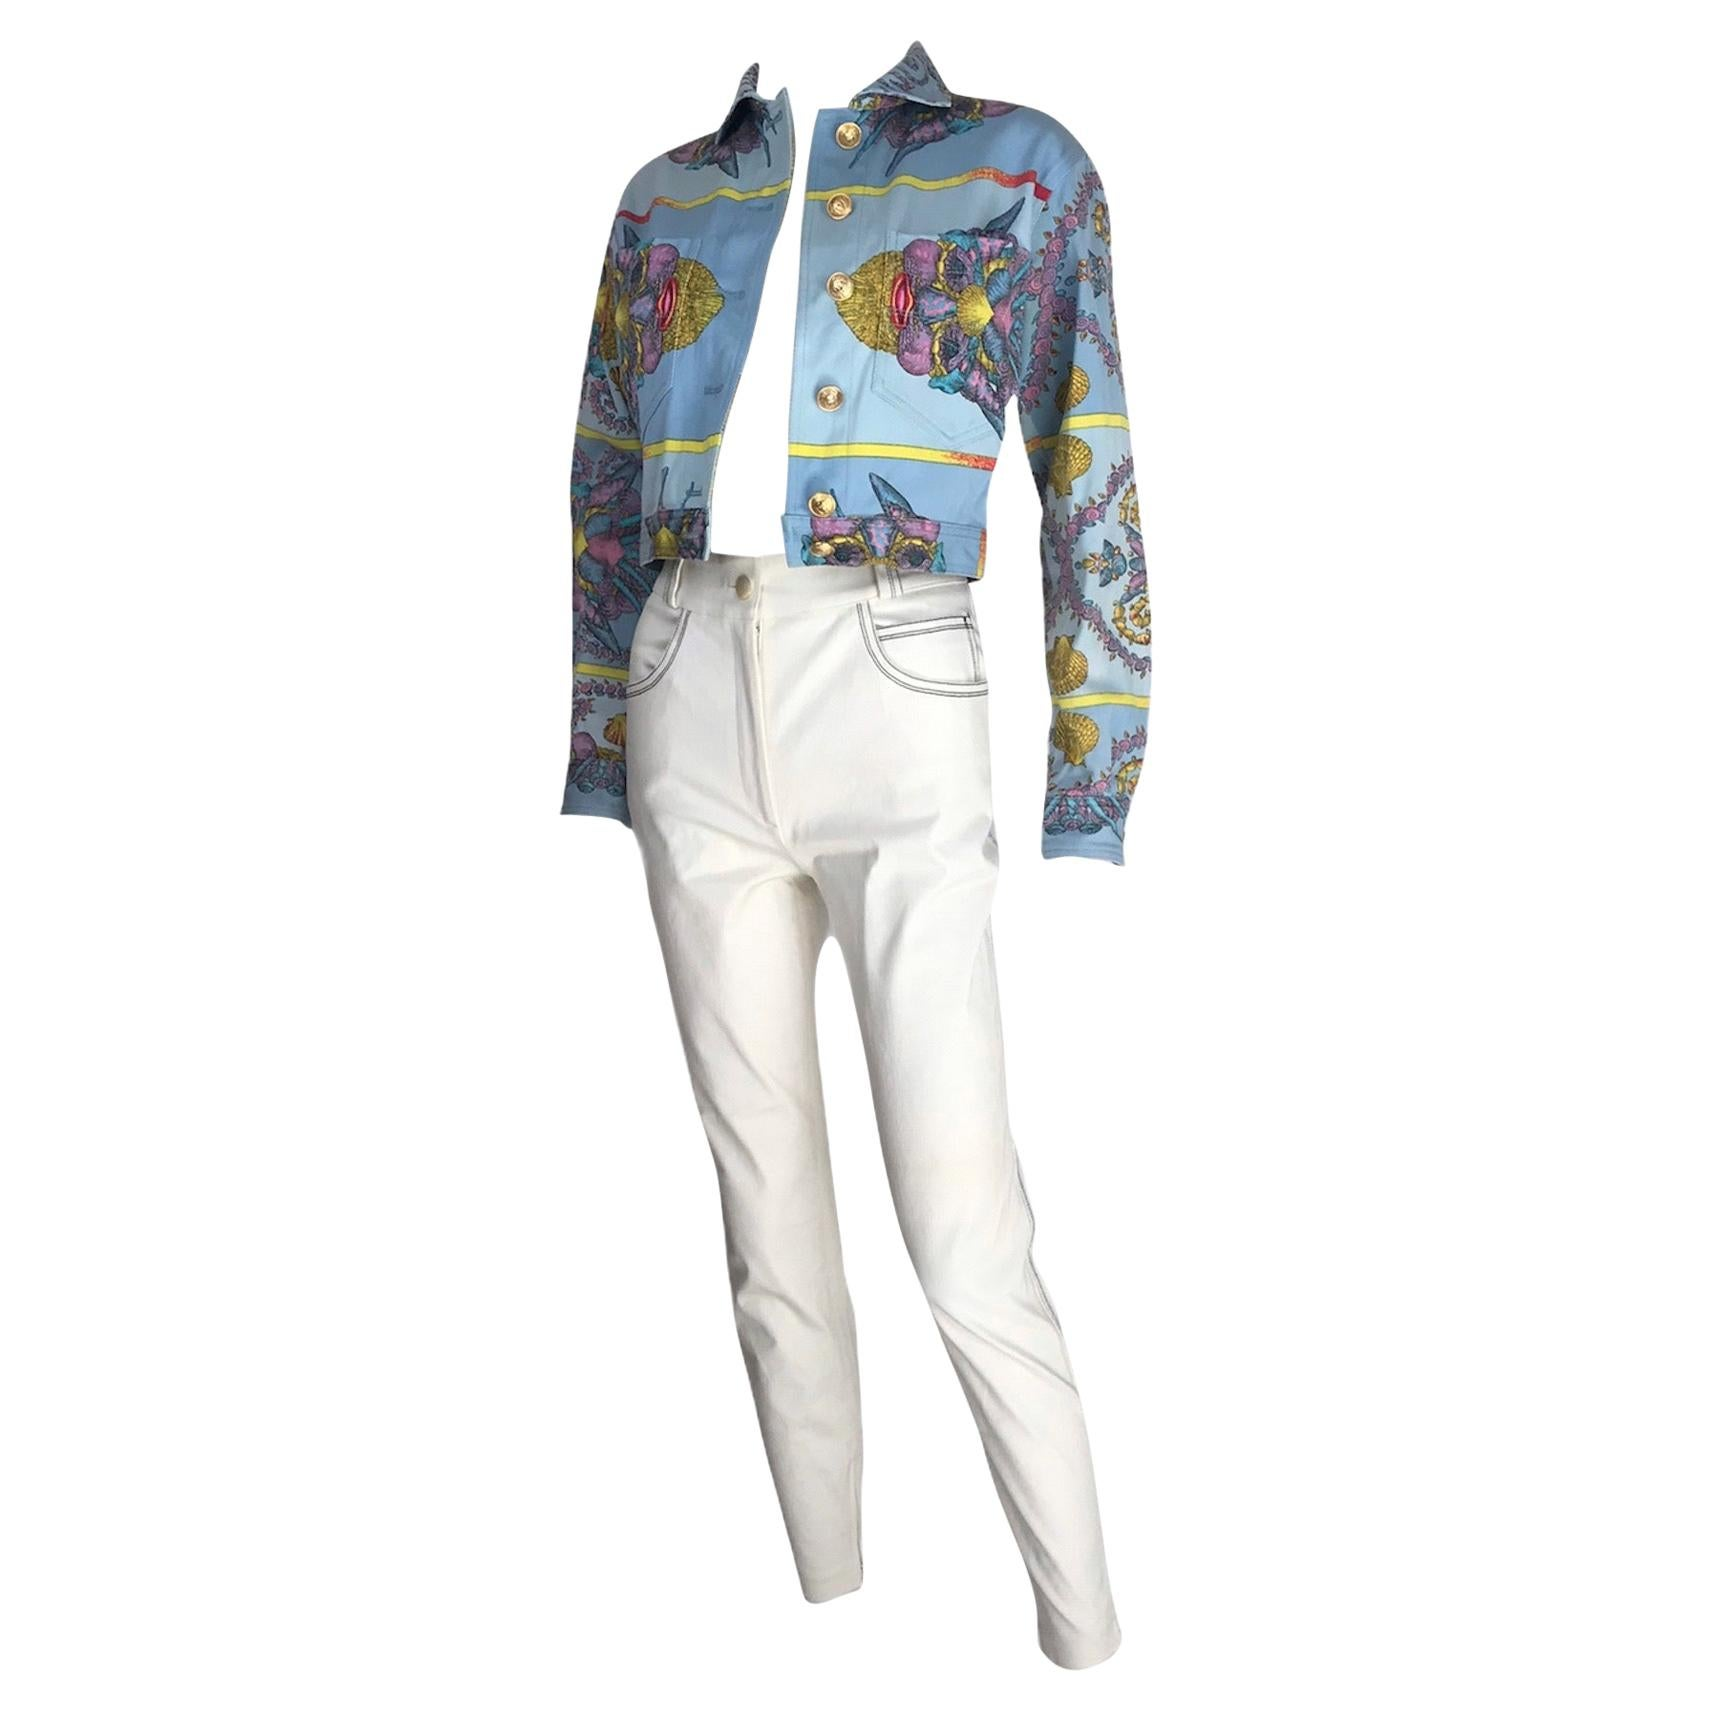 SS 1992 Gianni Versace Look 76  Seashell Set Trésors de la Mer Small